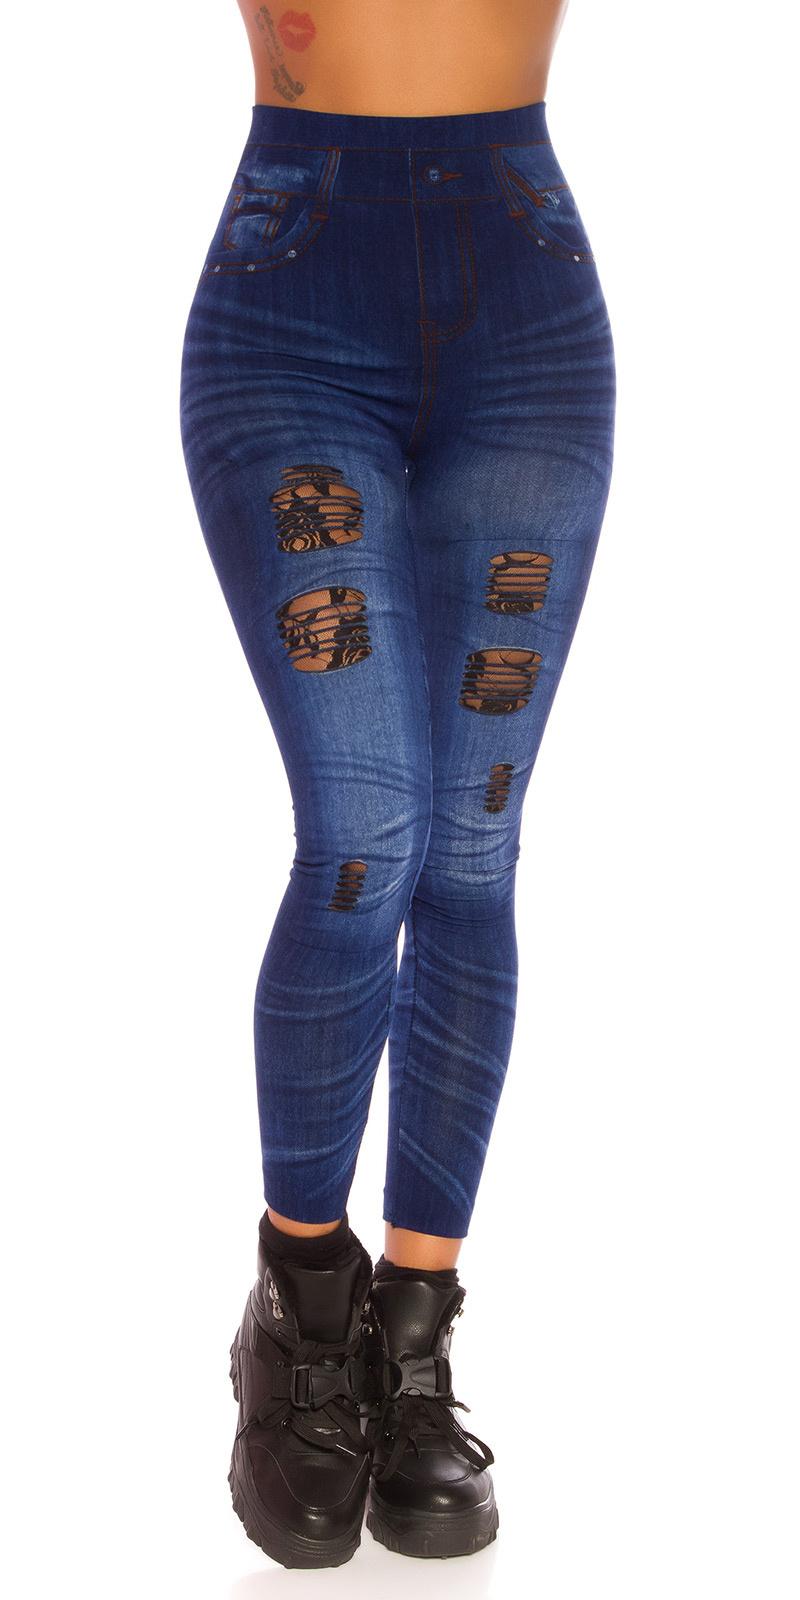 Sexy jeanslook leggings met kant cutouts blauw